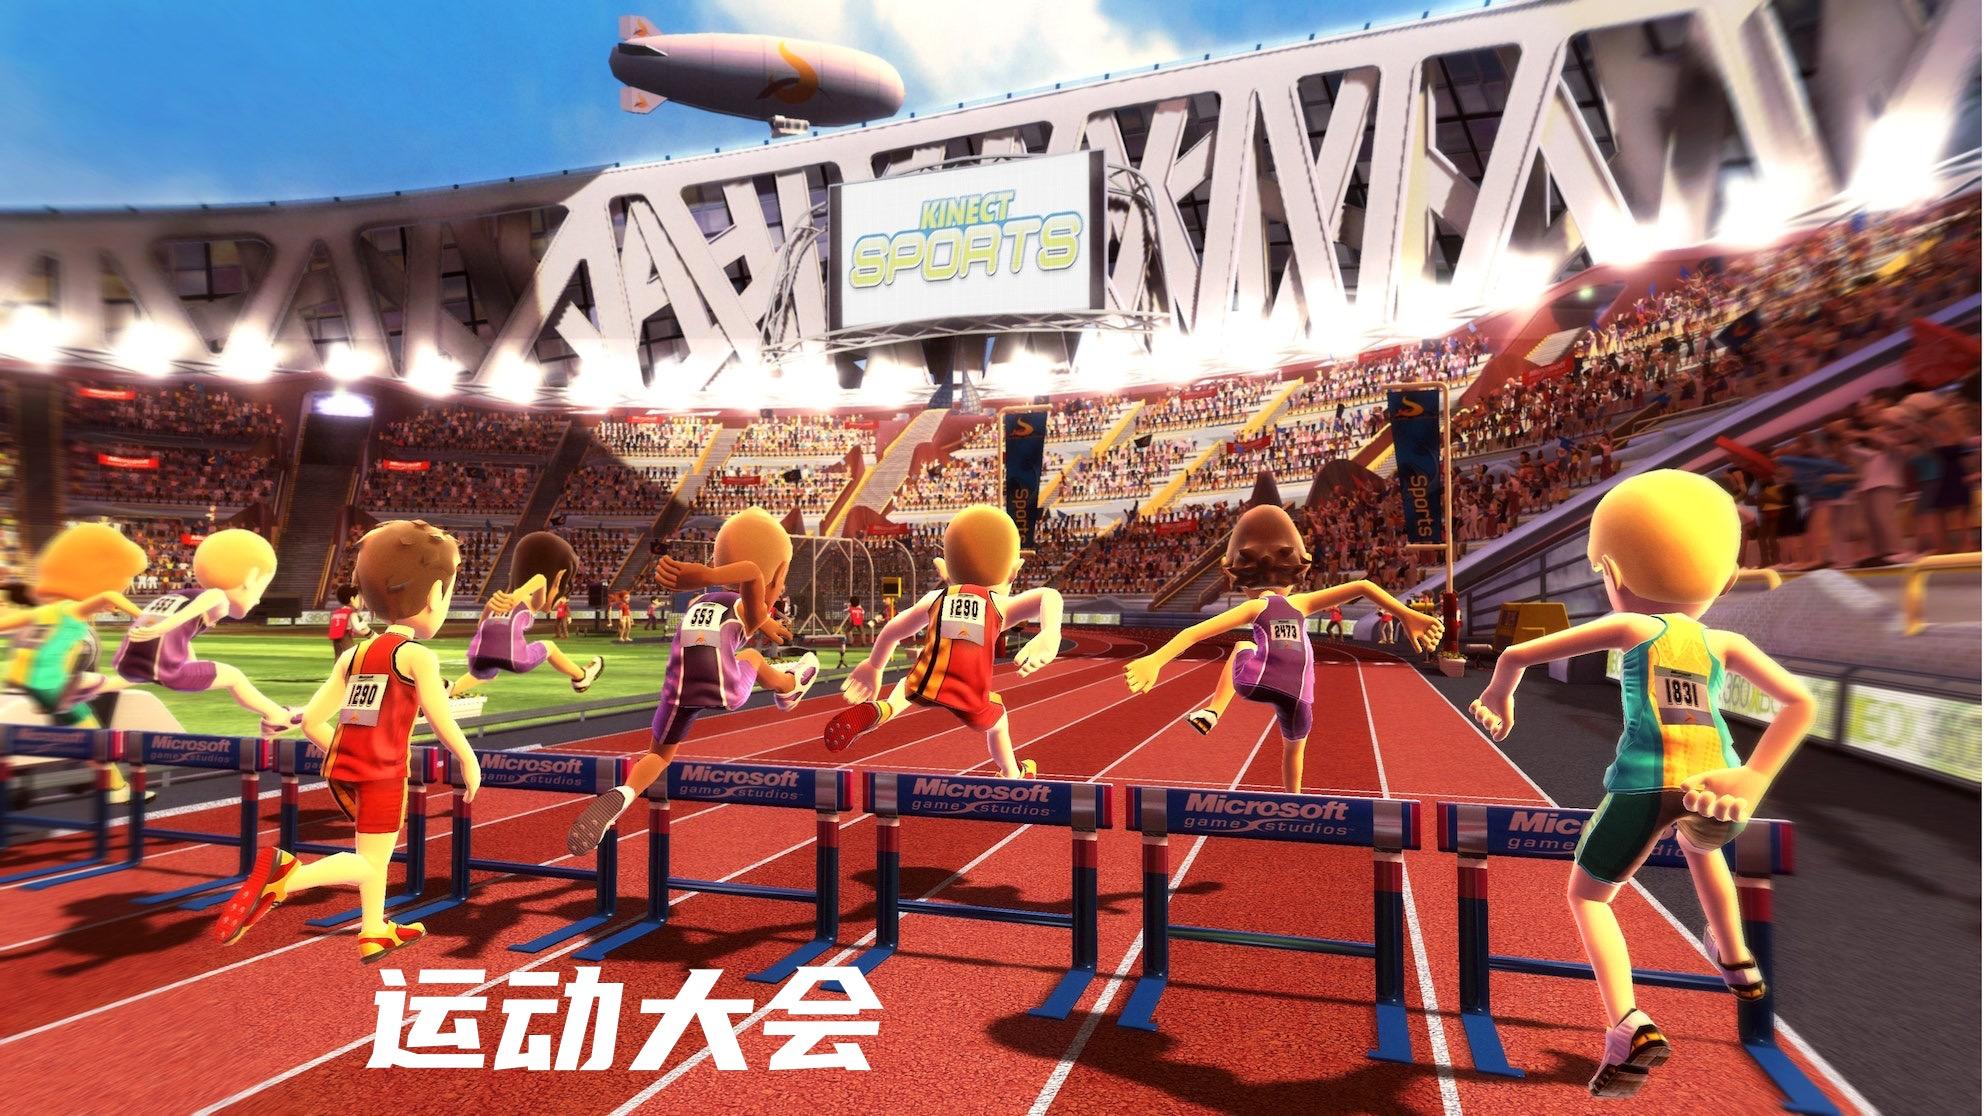 XBOX360 体感游戏 《运动大会》 中文 下载